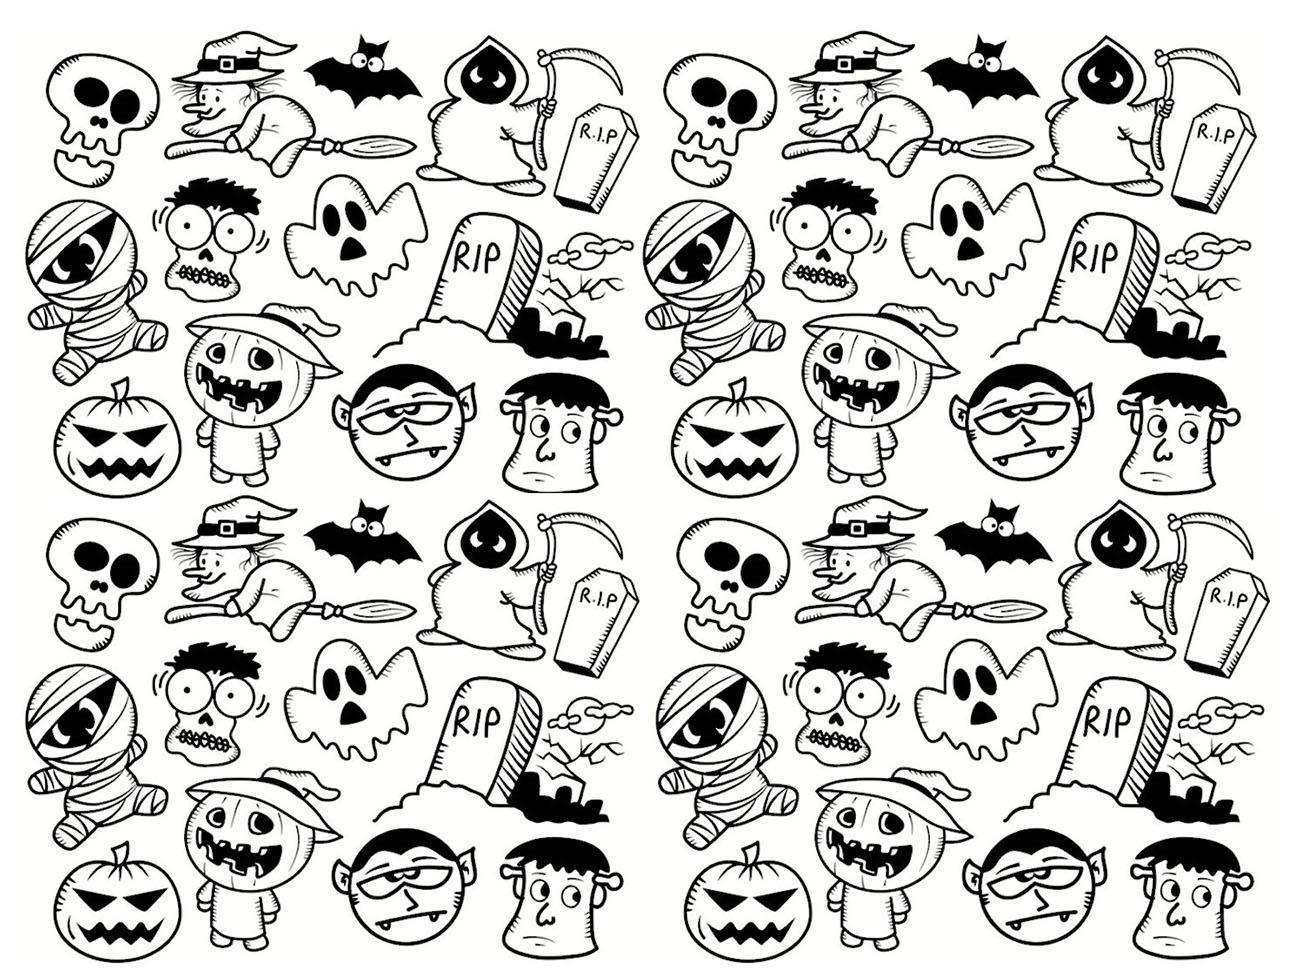 Doodle complexe pour Halloween